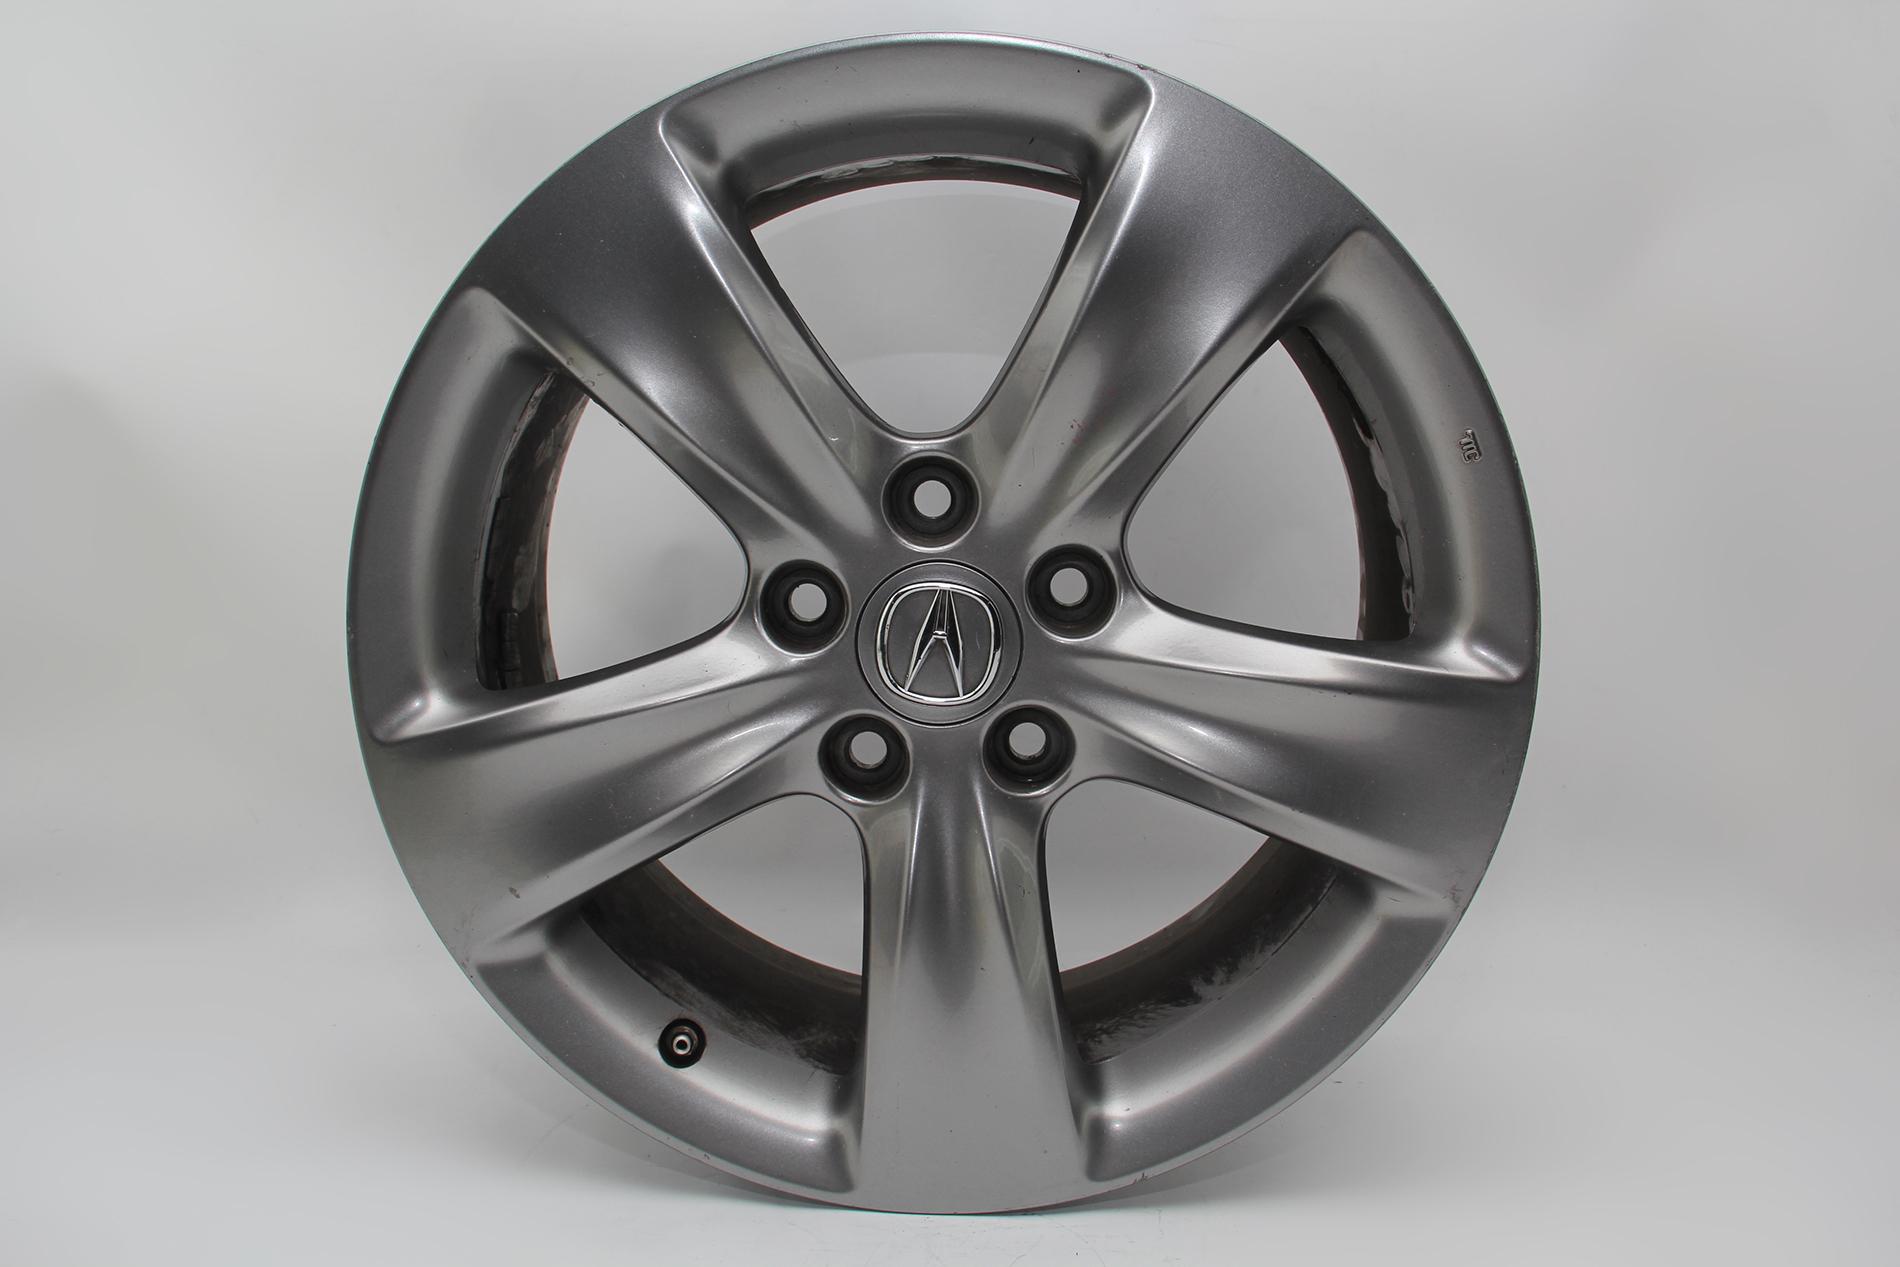 Acura TL 12-14 Alloy Wheel Rim Disc, 5 Spoke 18x8, 42700 ...